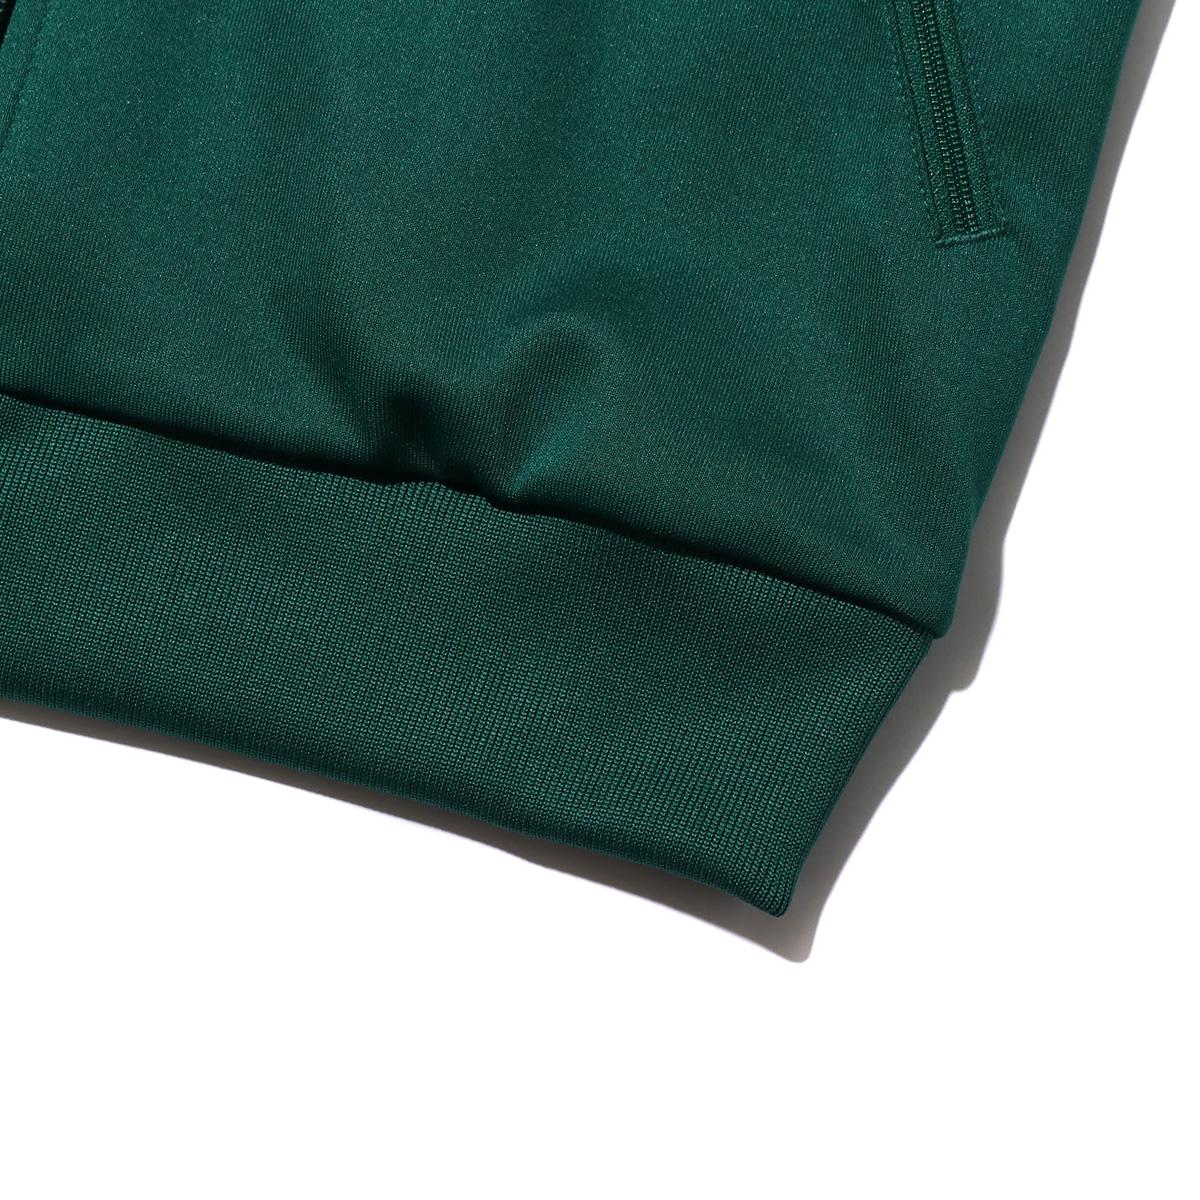 adidas Originals SST TRACK TOP (the Adidas originals SST truck top) COLLEGEATE GREEN 19SS I